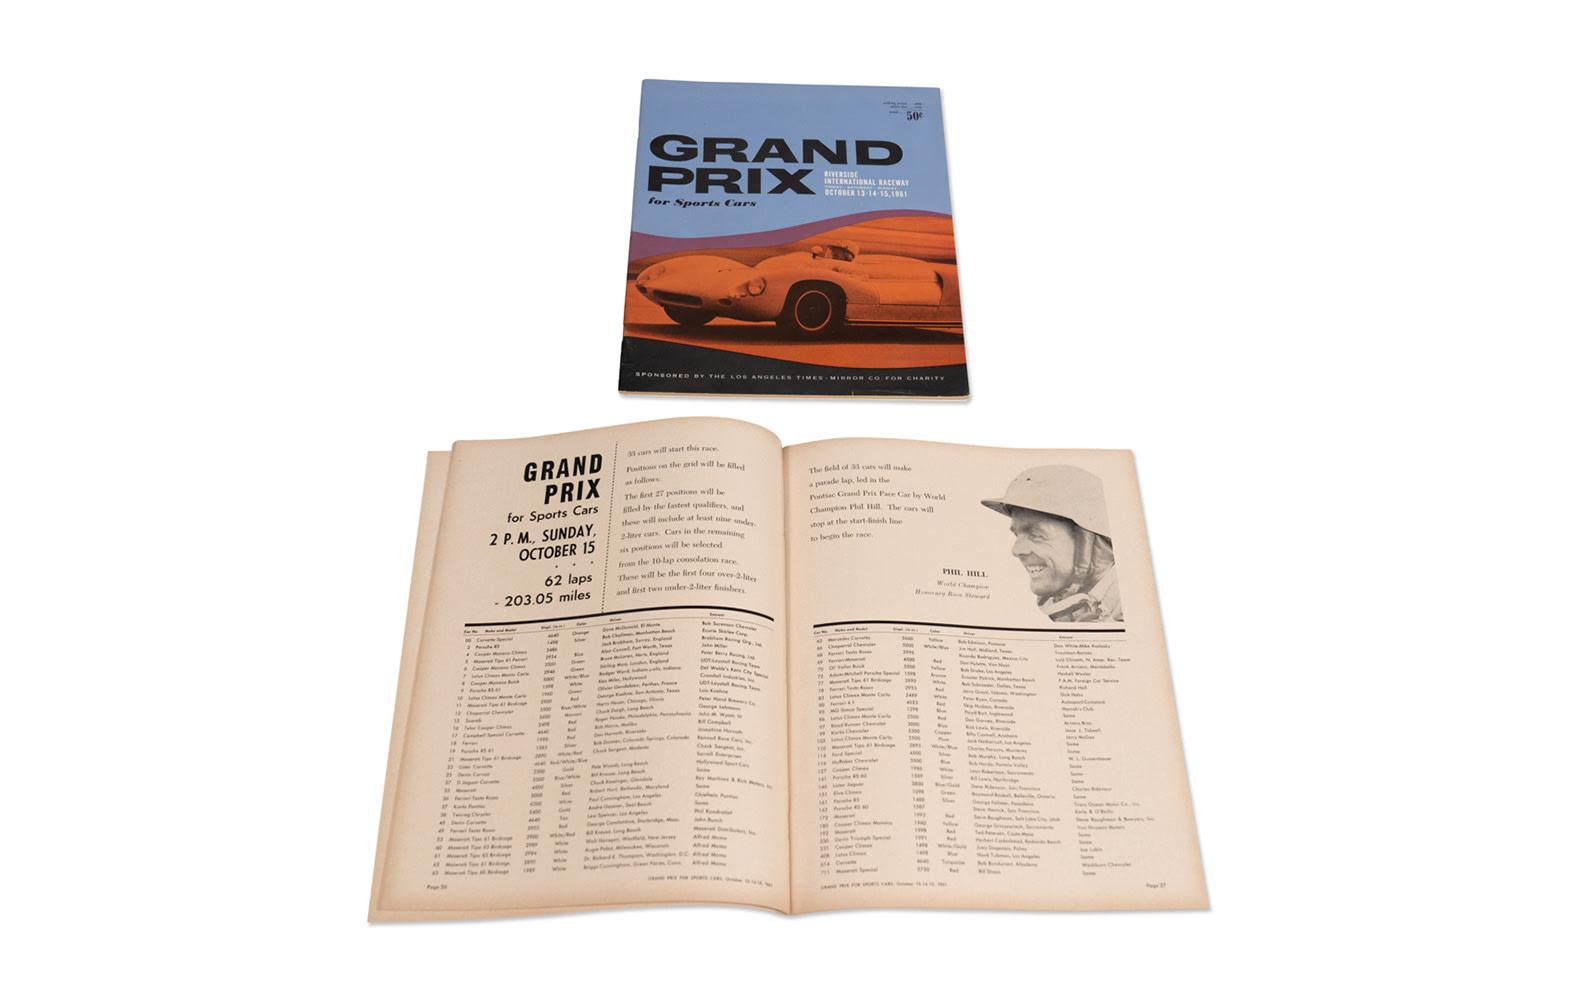 1961 Grand Prix for Sports Cars at Riverside International Raceway Race Programs